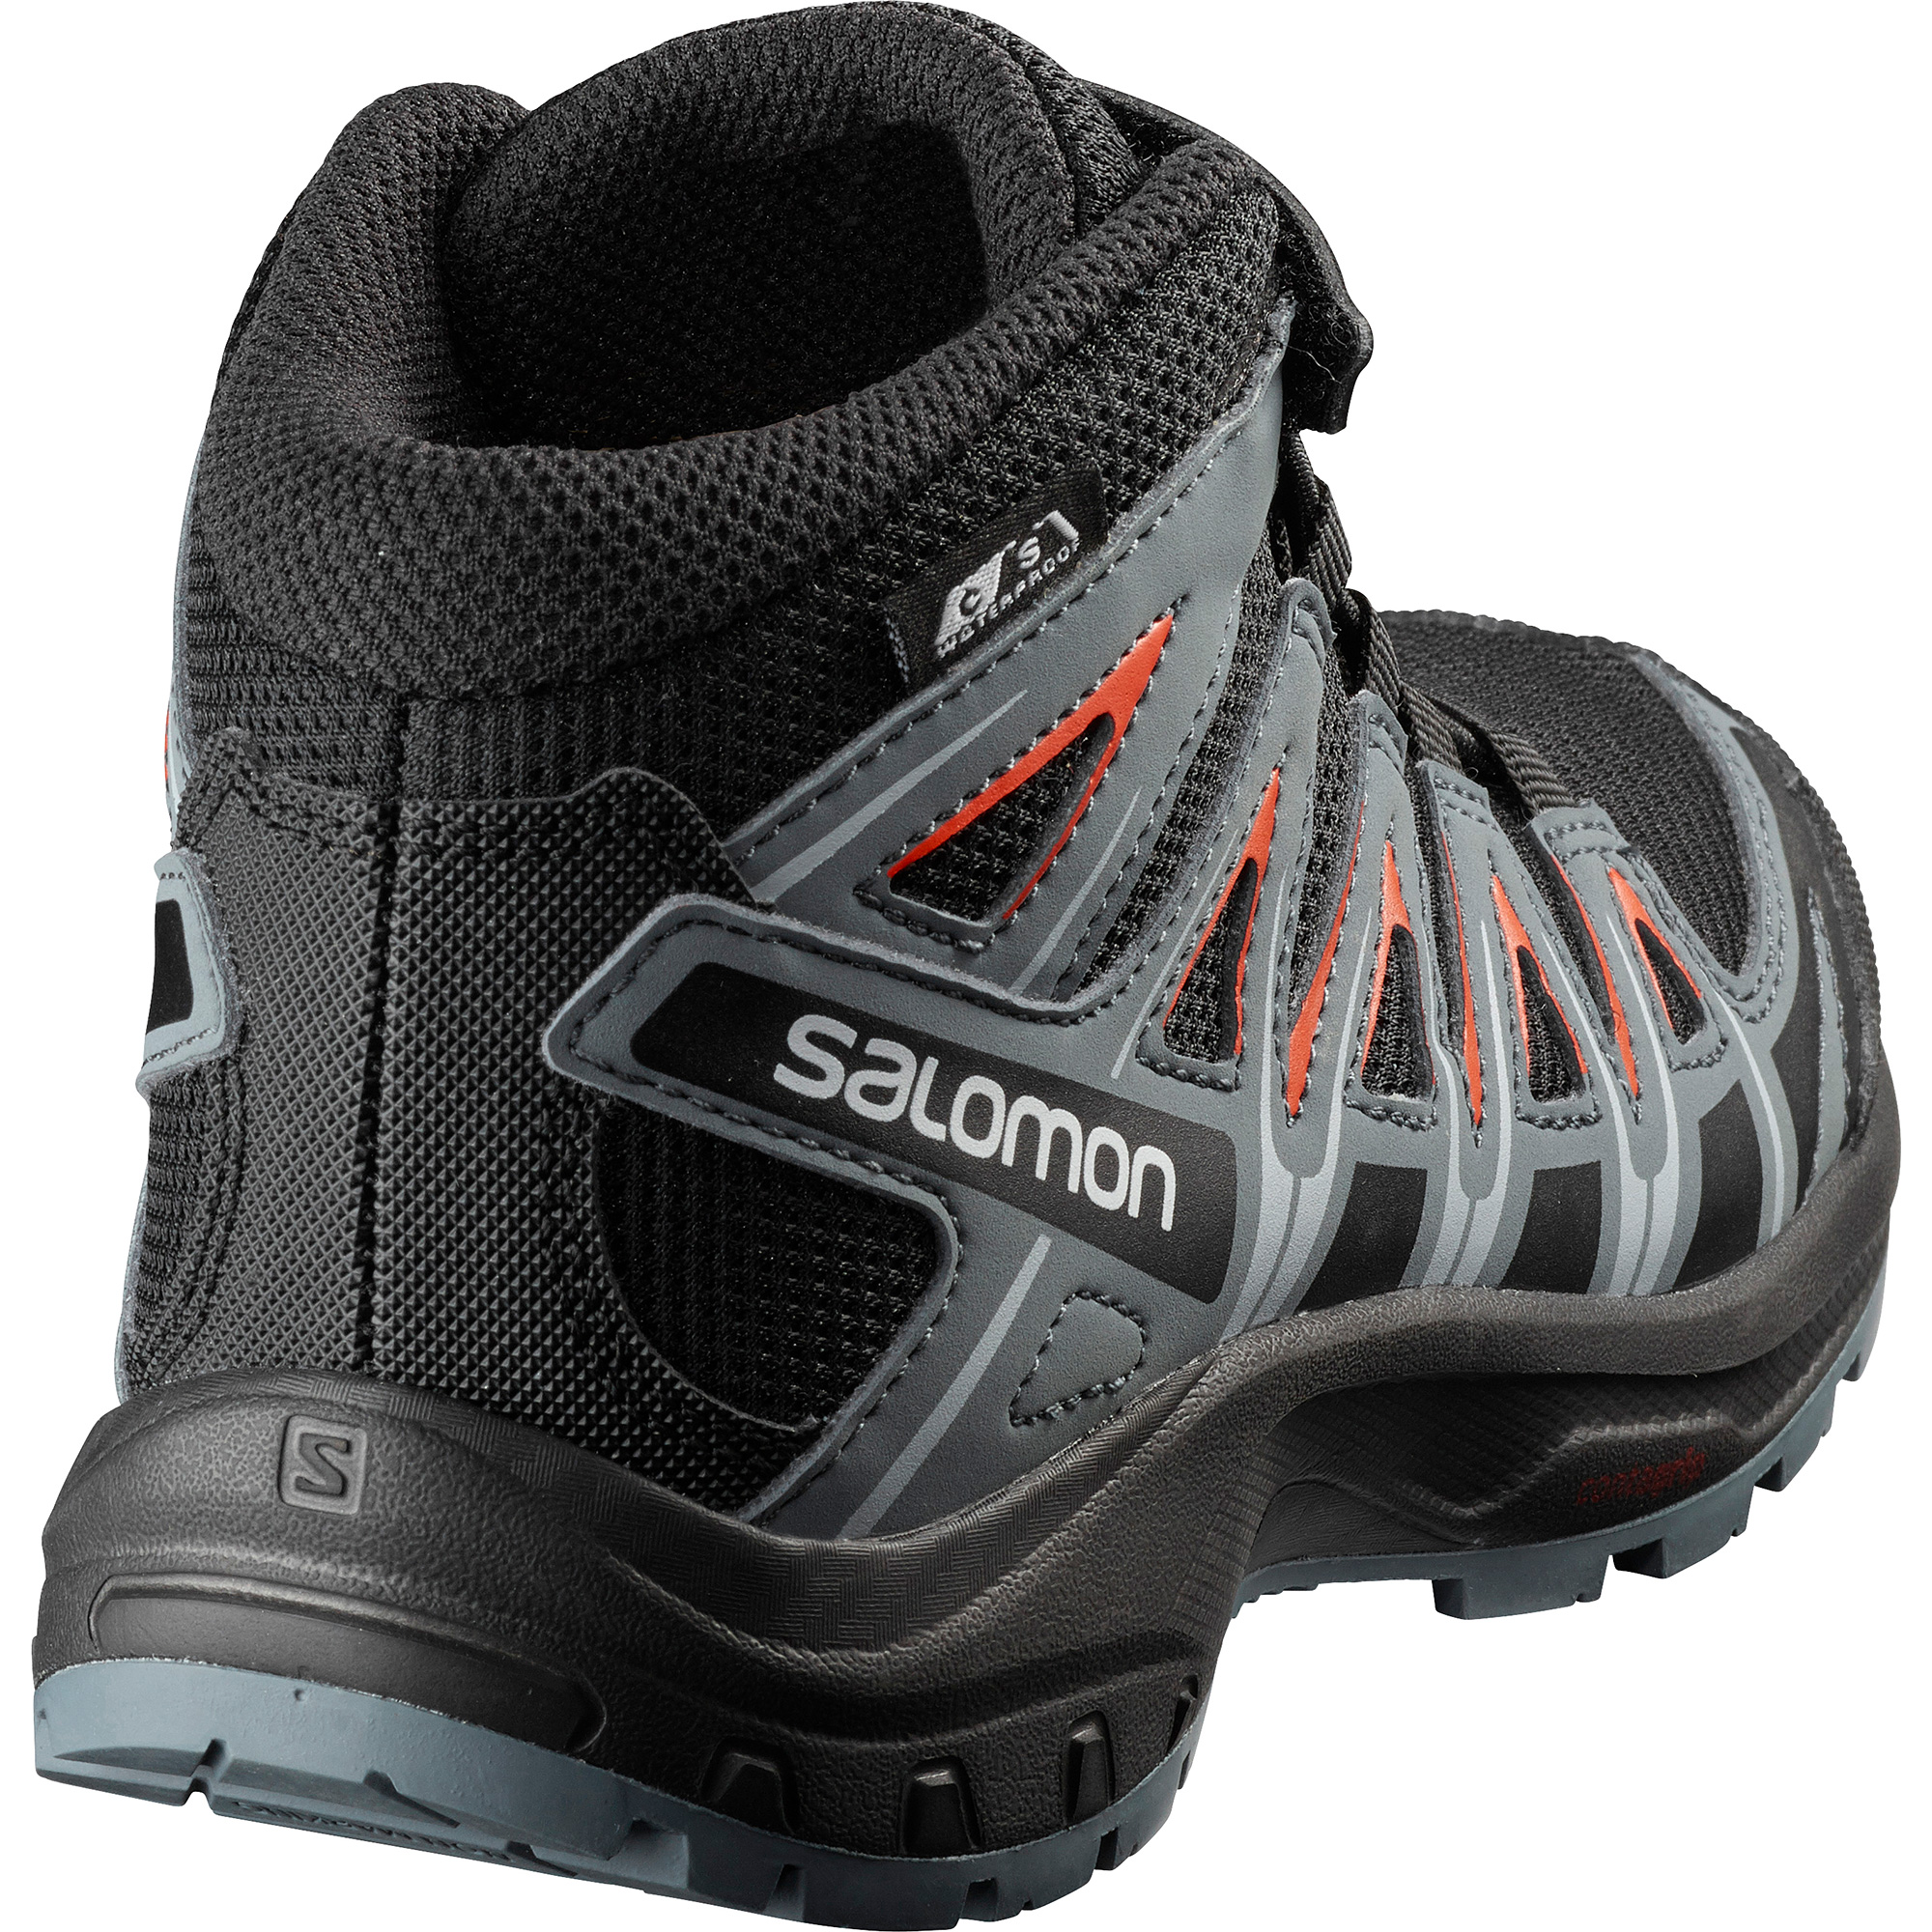 Buty zimowe Salomon XA PRO 3D MID CSWP J (406512)   Woliniusz.pl